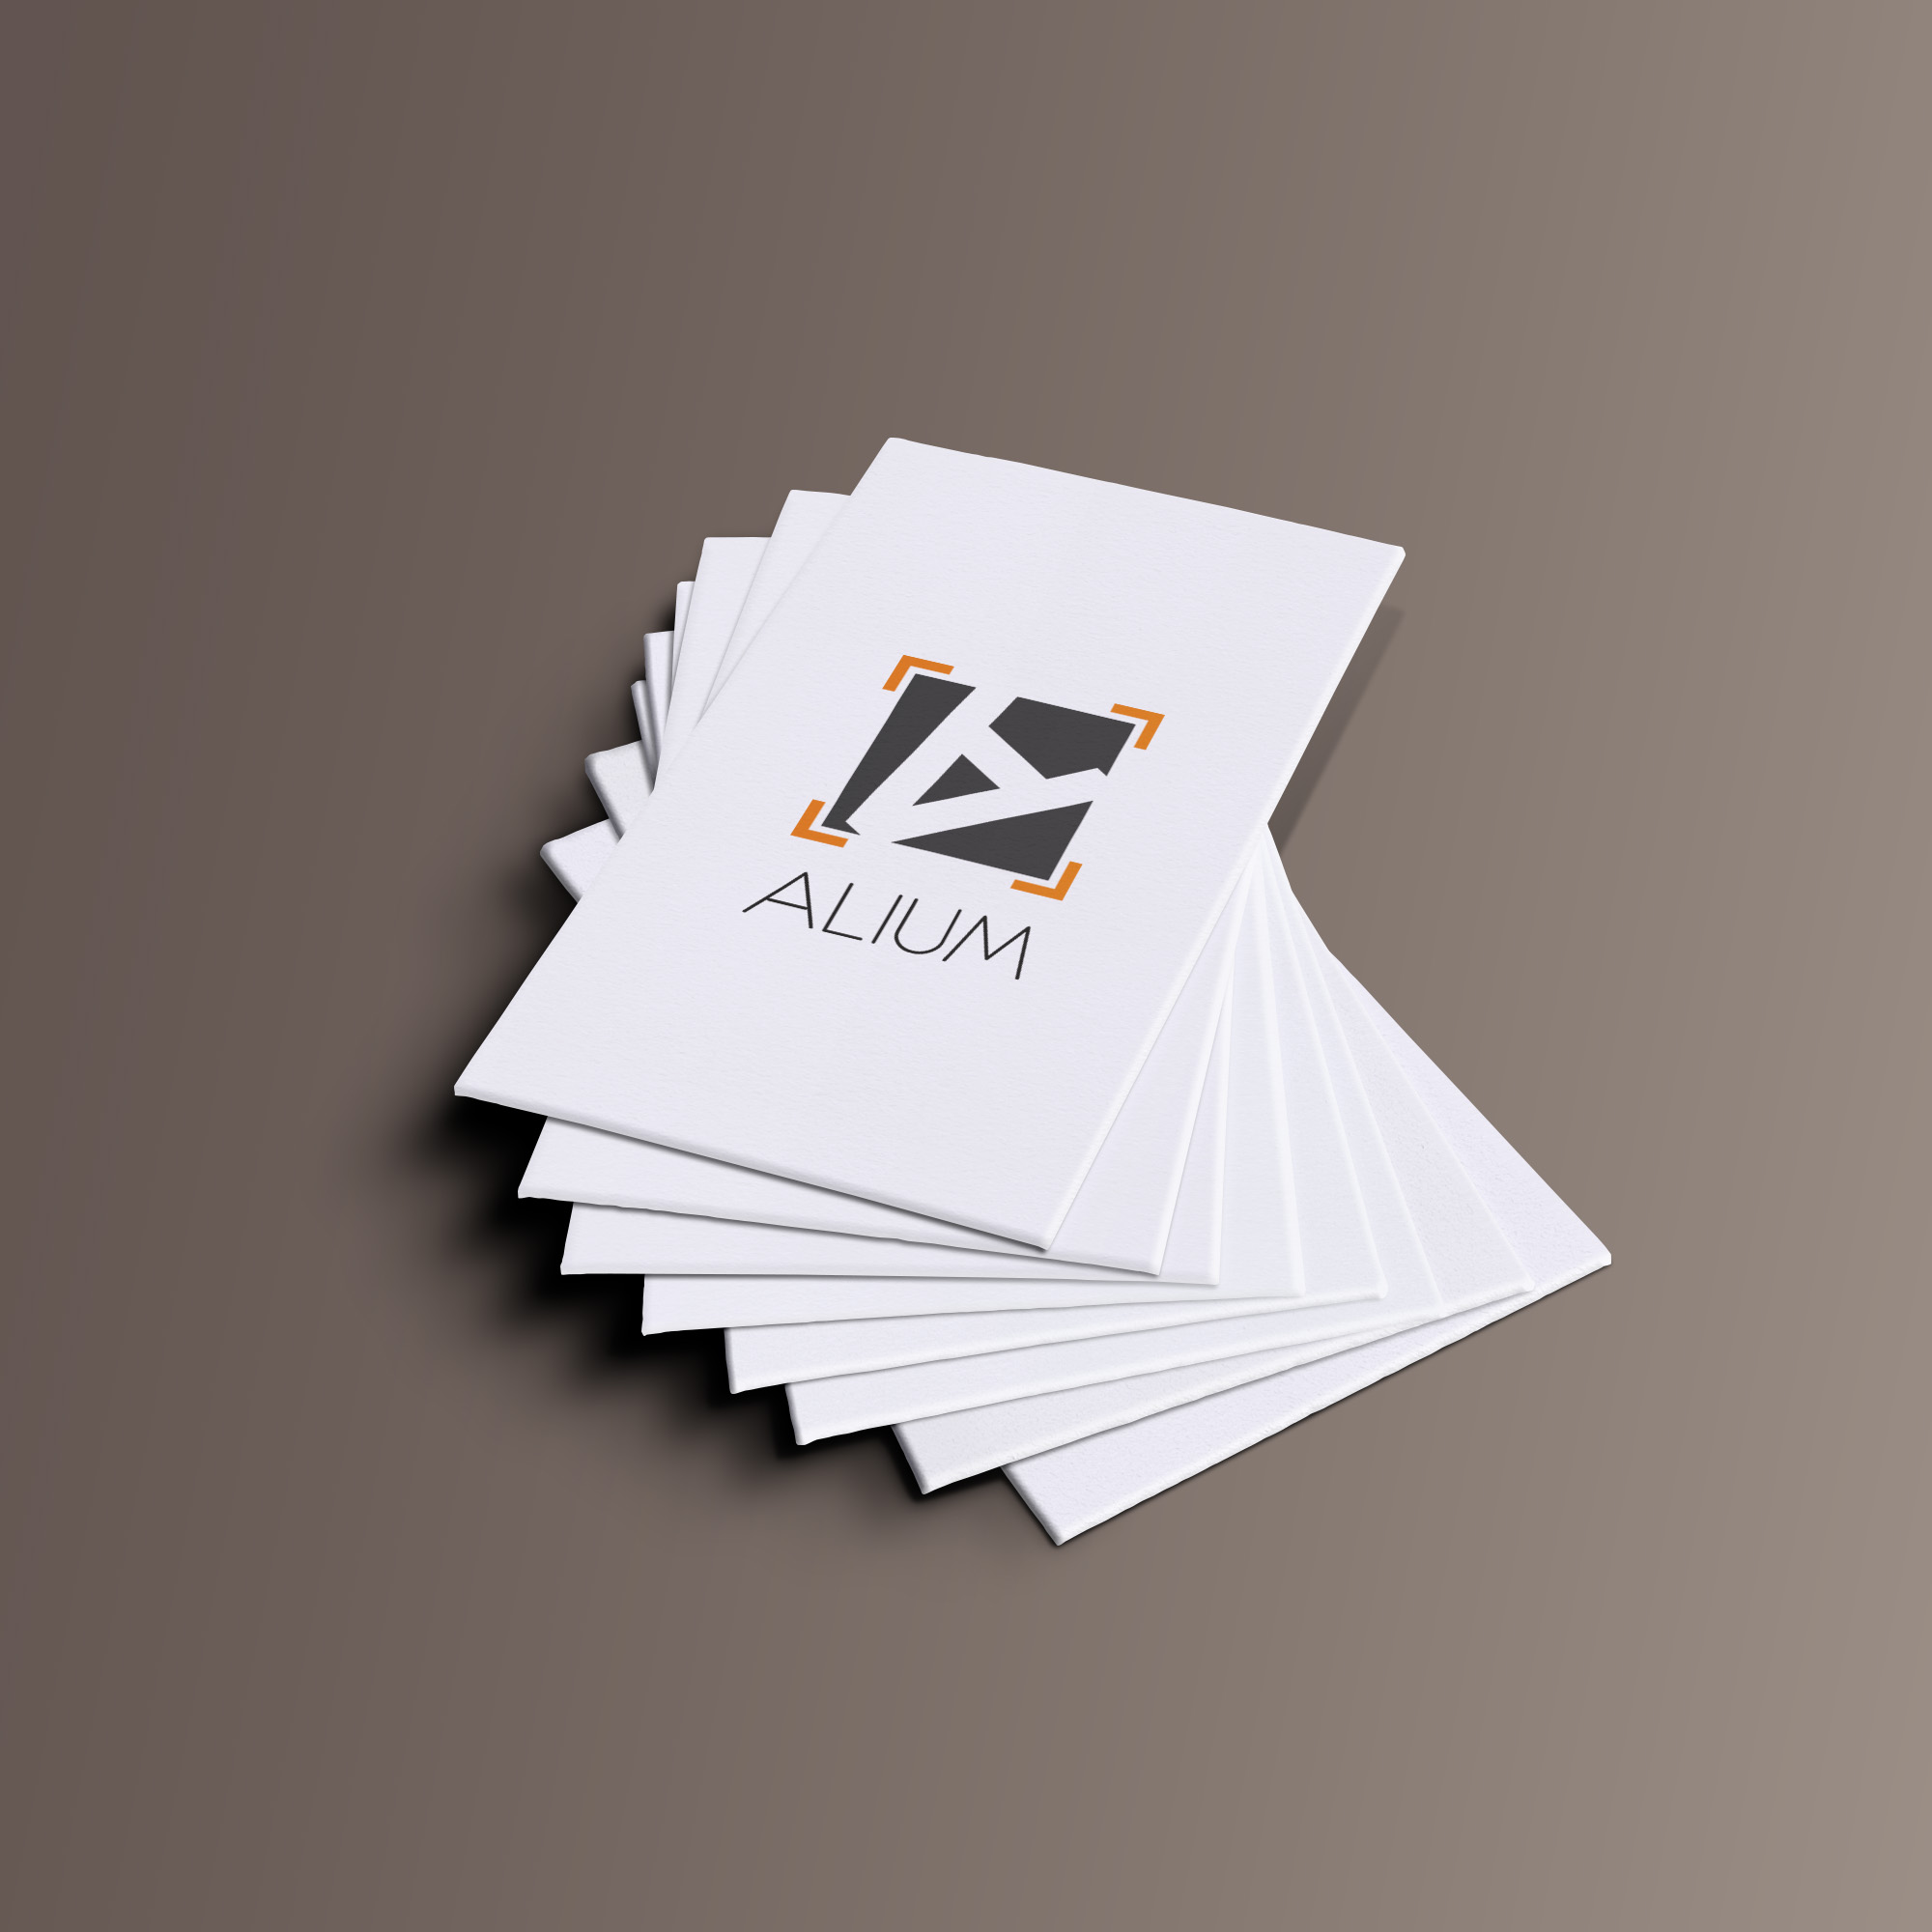 Логотип для дизайн студии фото f_30059e345a9ad7f1.jpg